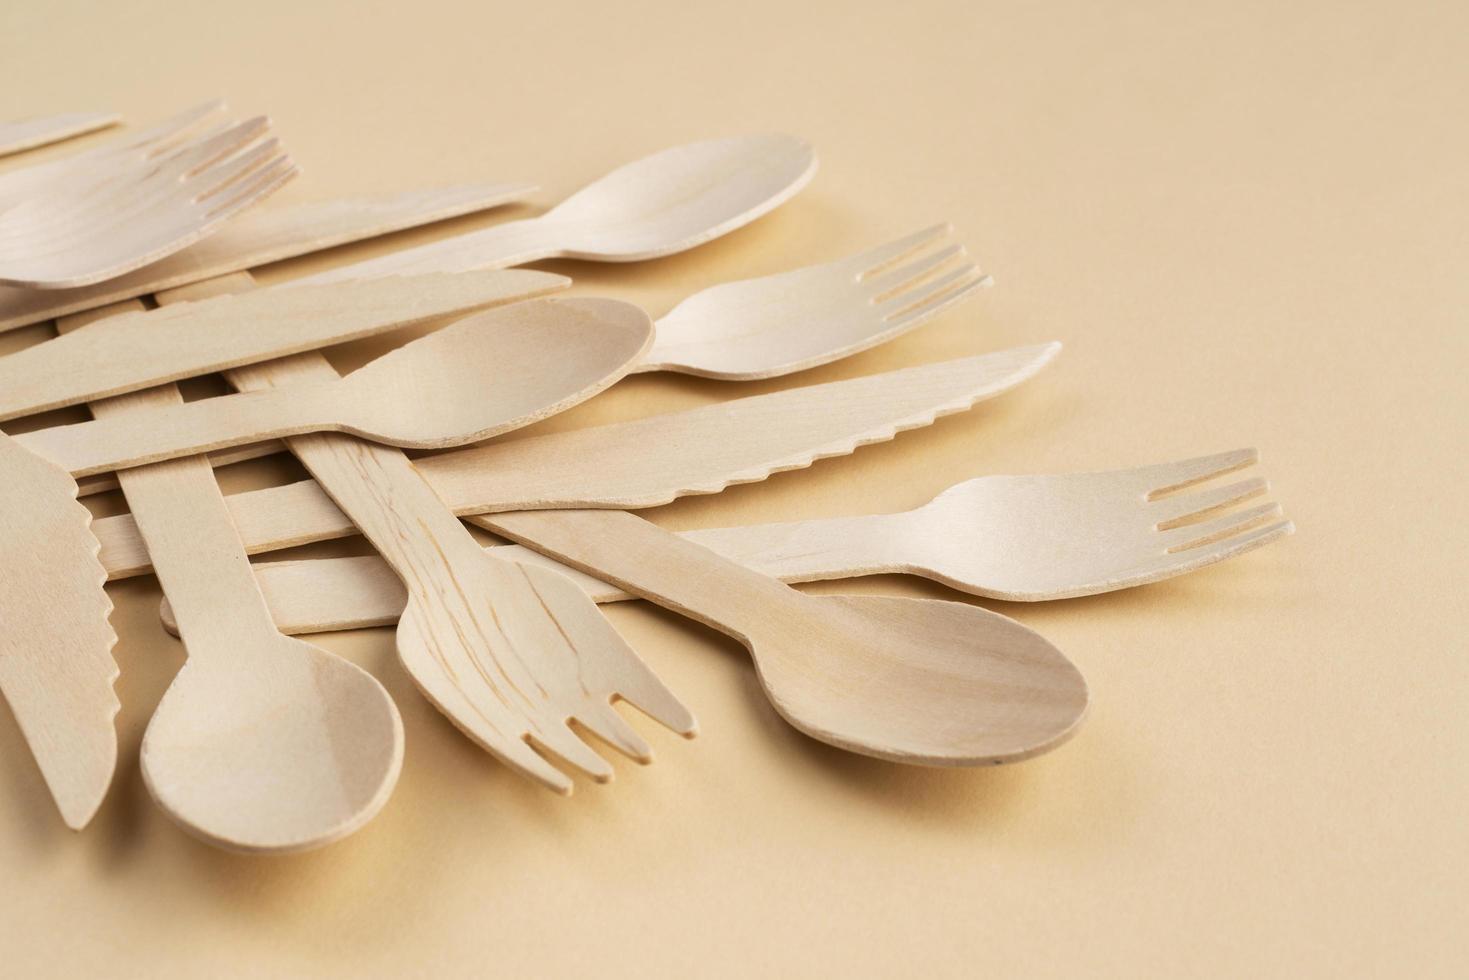 bamboe gebruiksvoorwerpen op tan achtergrond foto